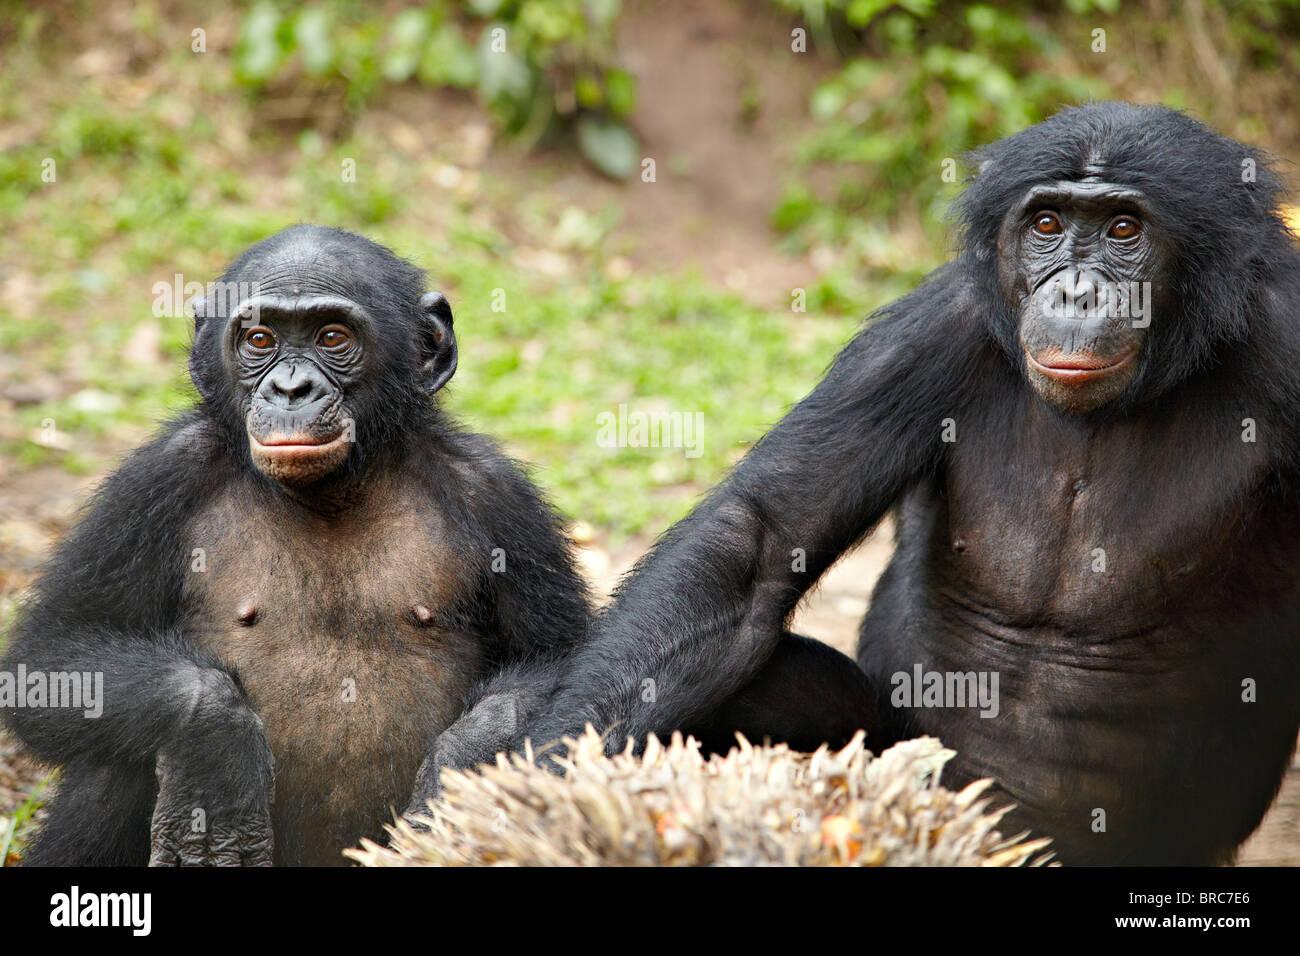 Two Bonobos (Pan paniscus), Democratic Republic of Congo, Africa - Stock Image